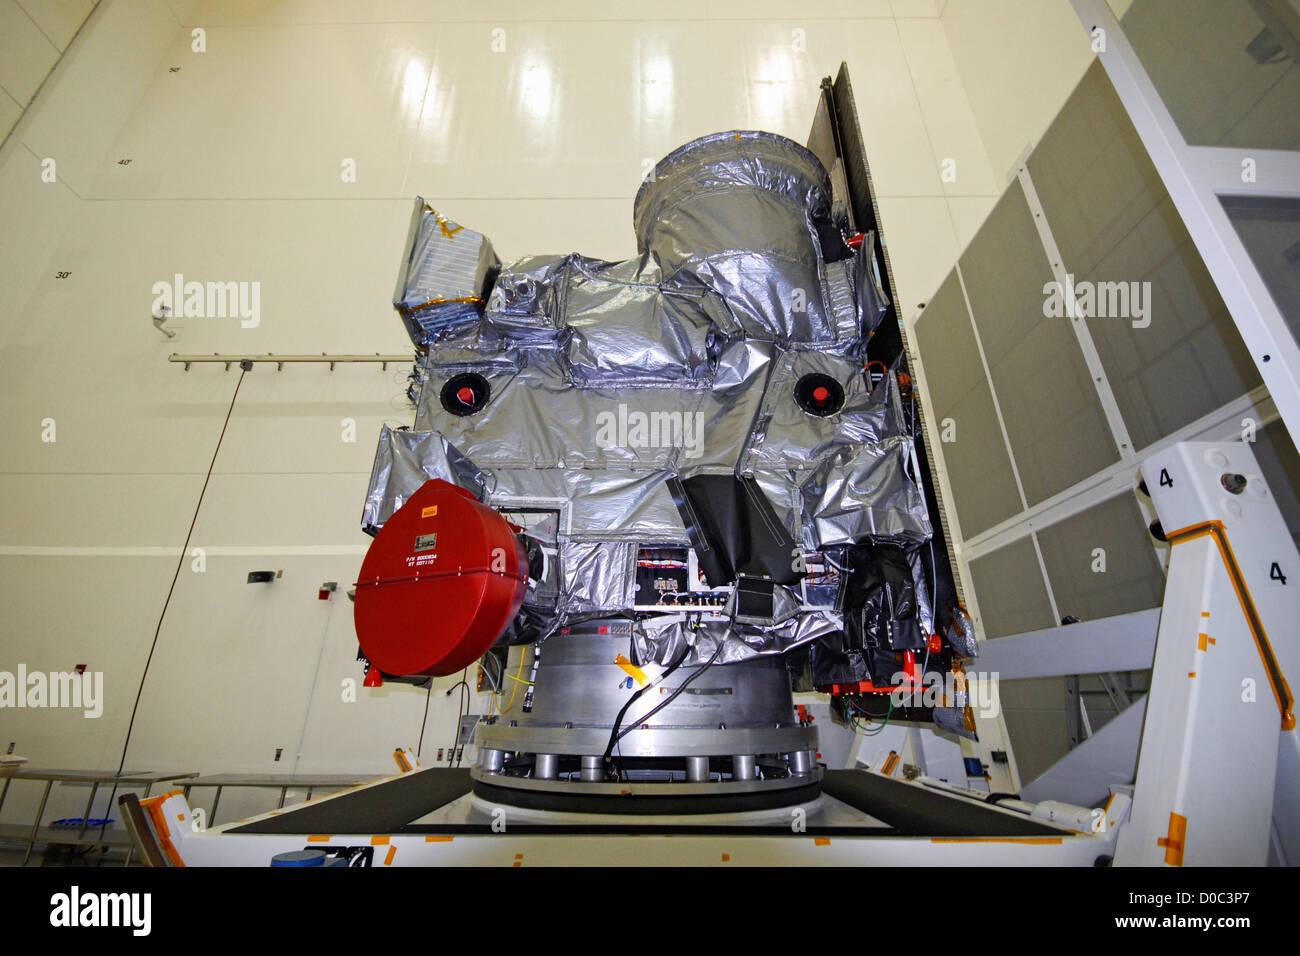 NASA NOAA's GOES-O (Geostationary Operational Environmental Satellite) weather satellite is prepared launch - Stock Image